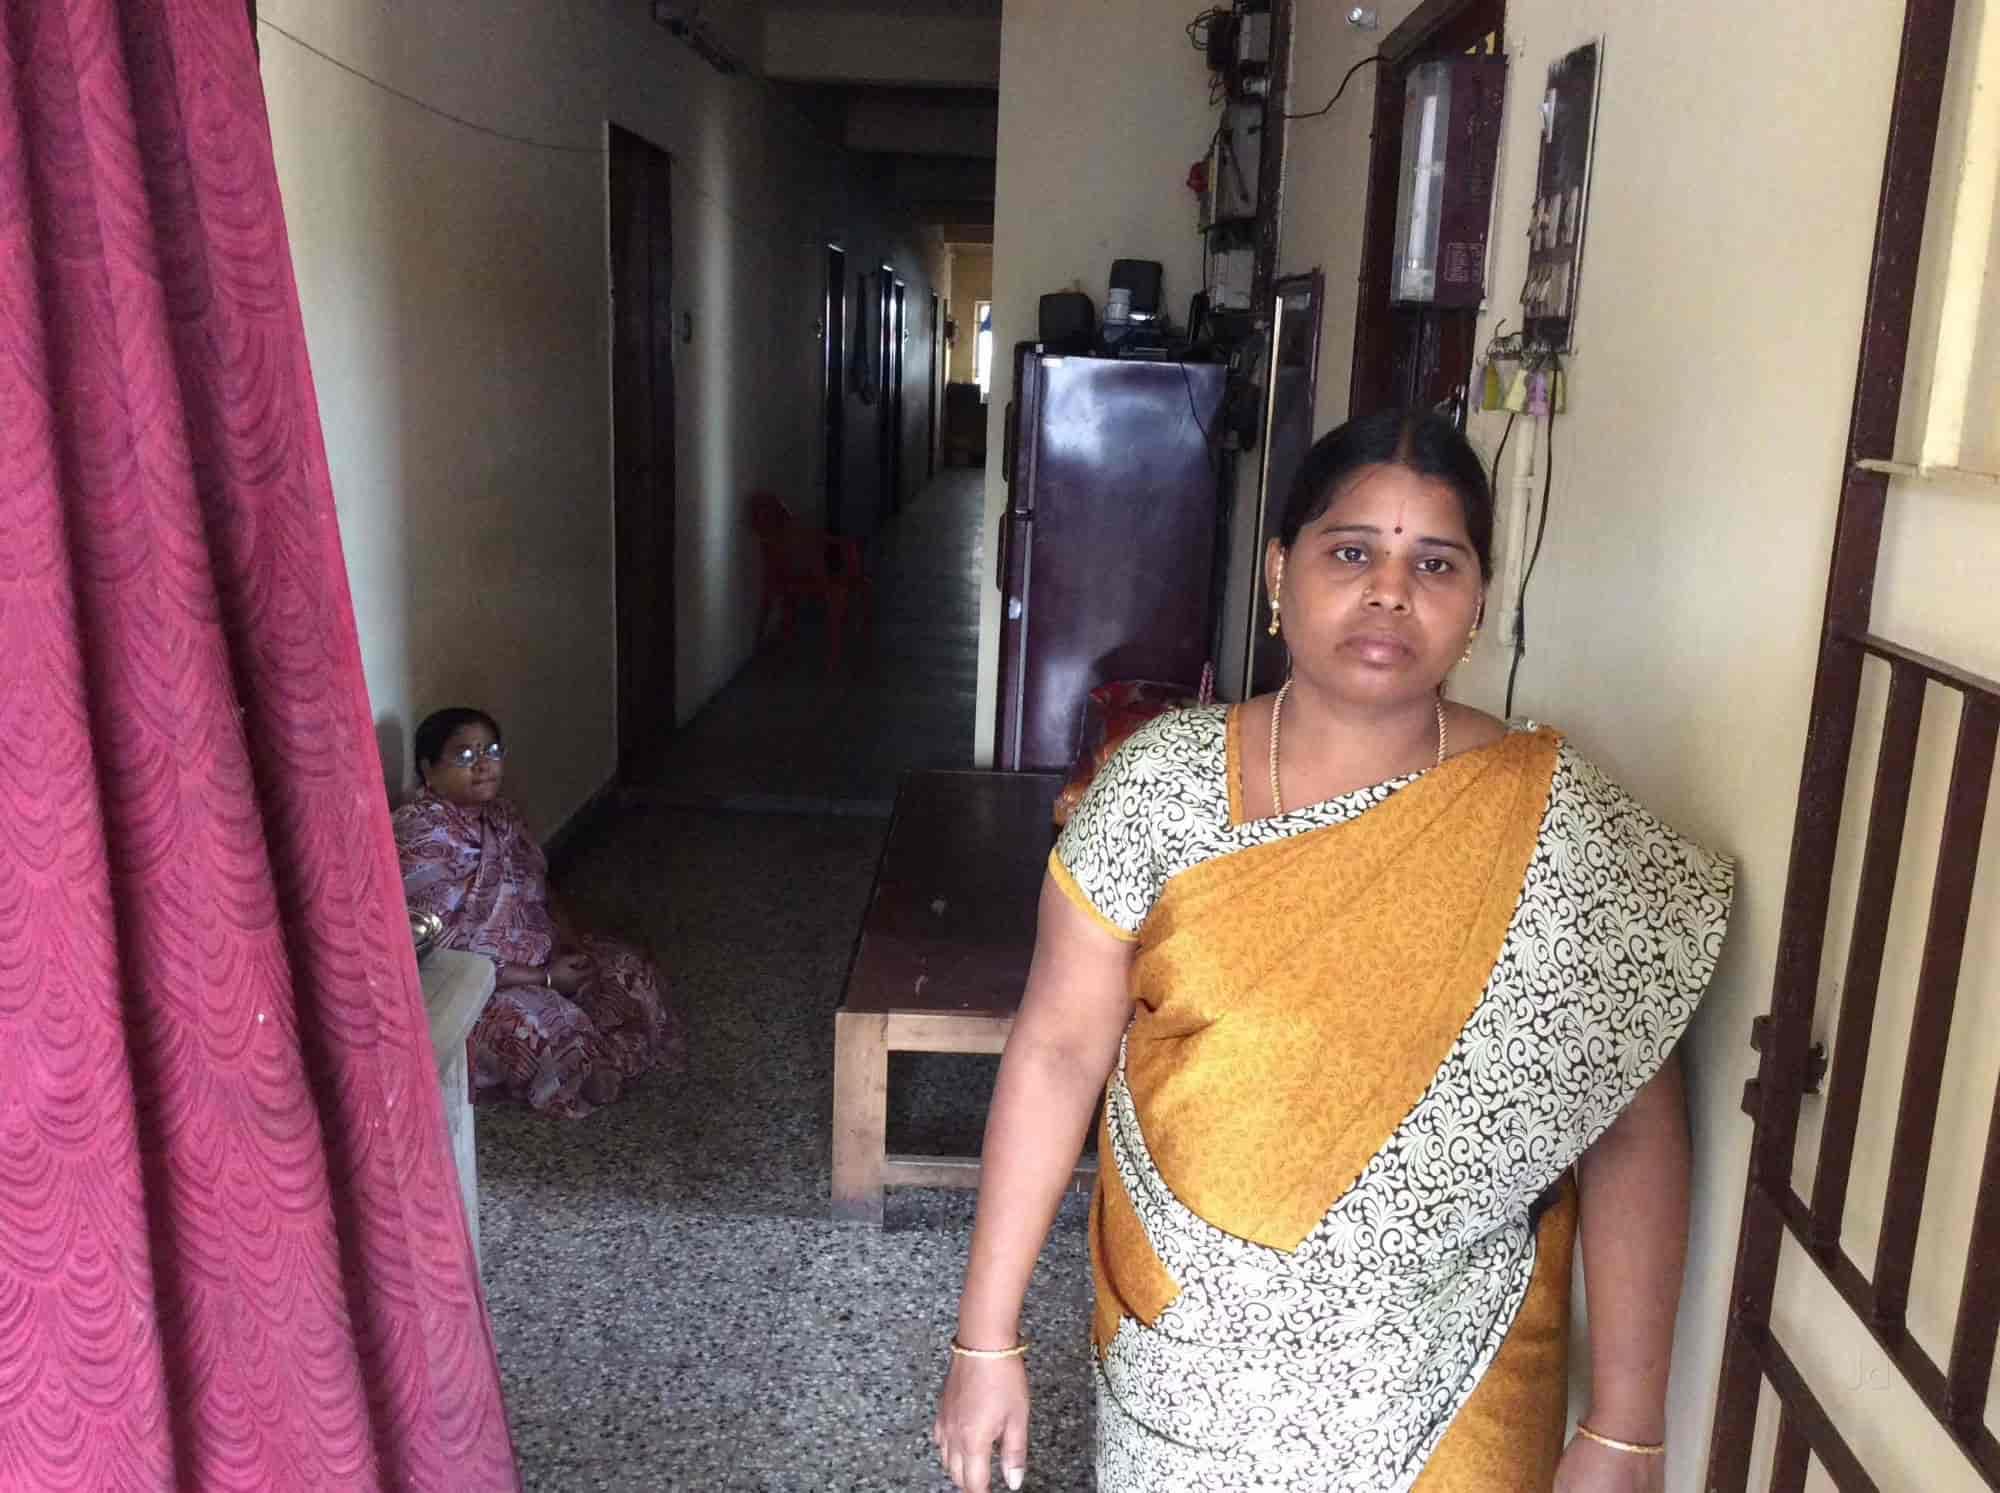 Sai Womens Hostel, Ayanavaram - Hostels For Working Women in Chennai